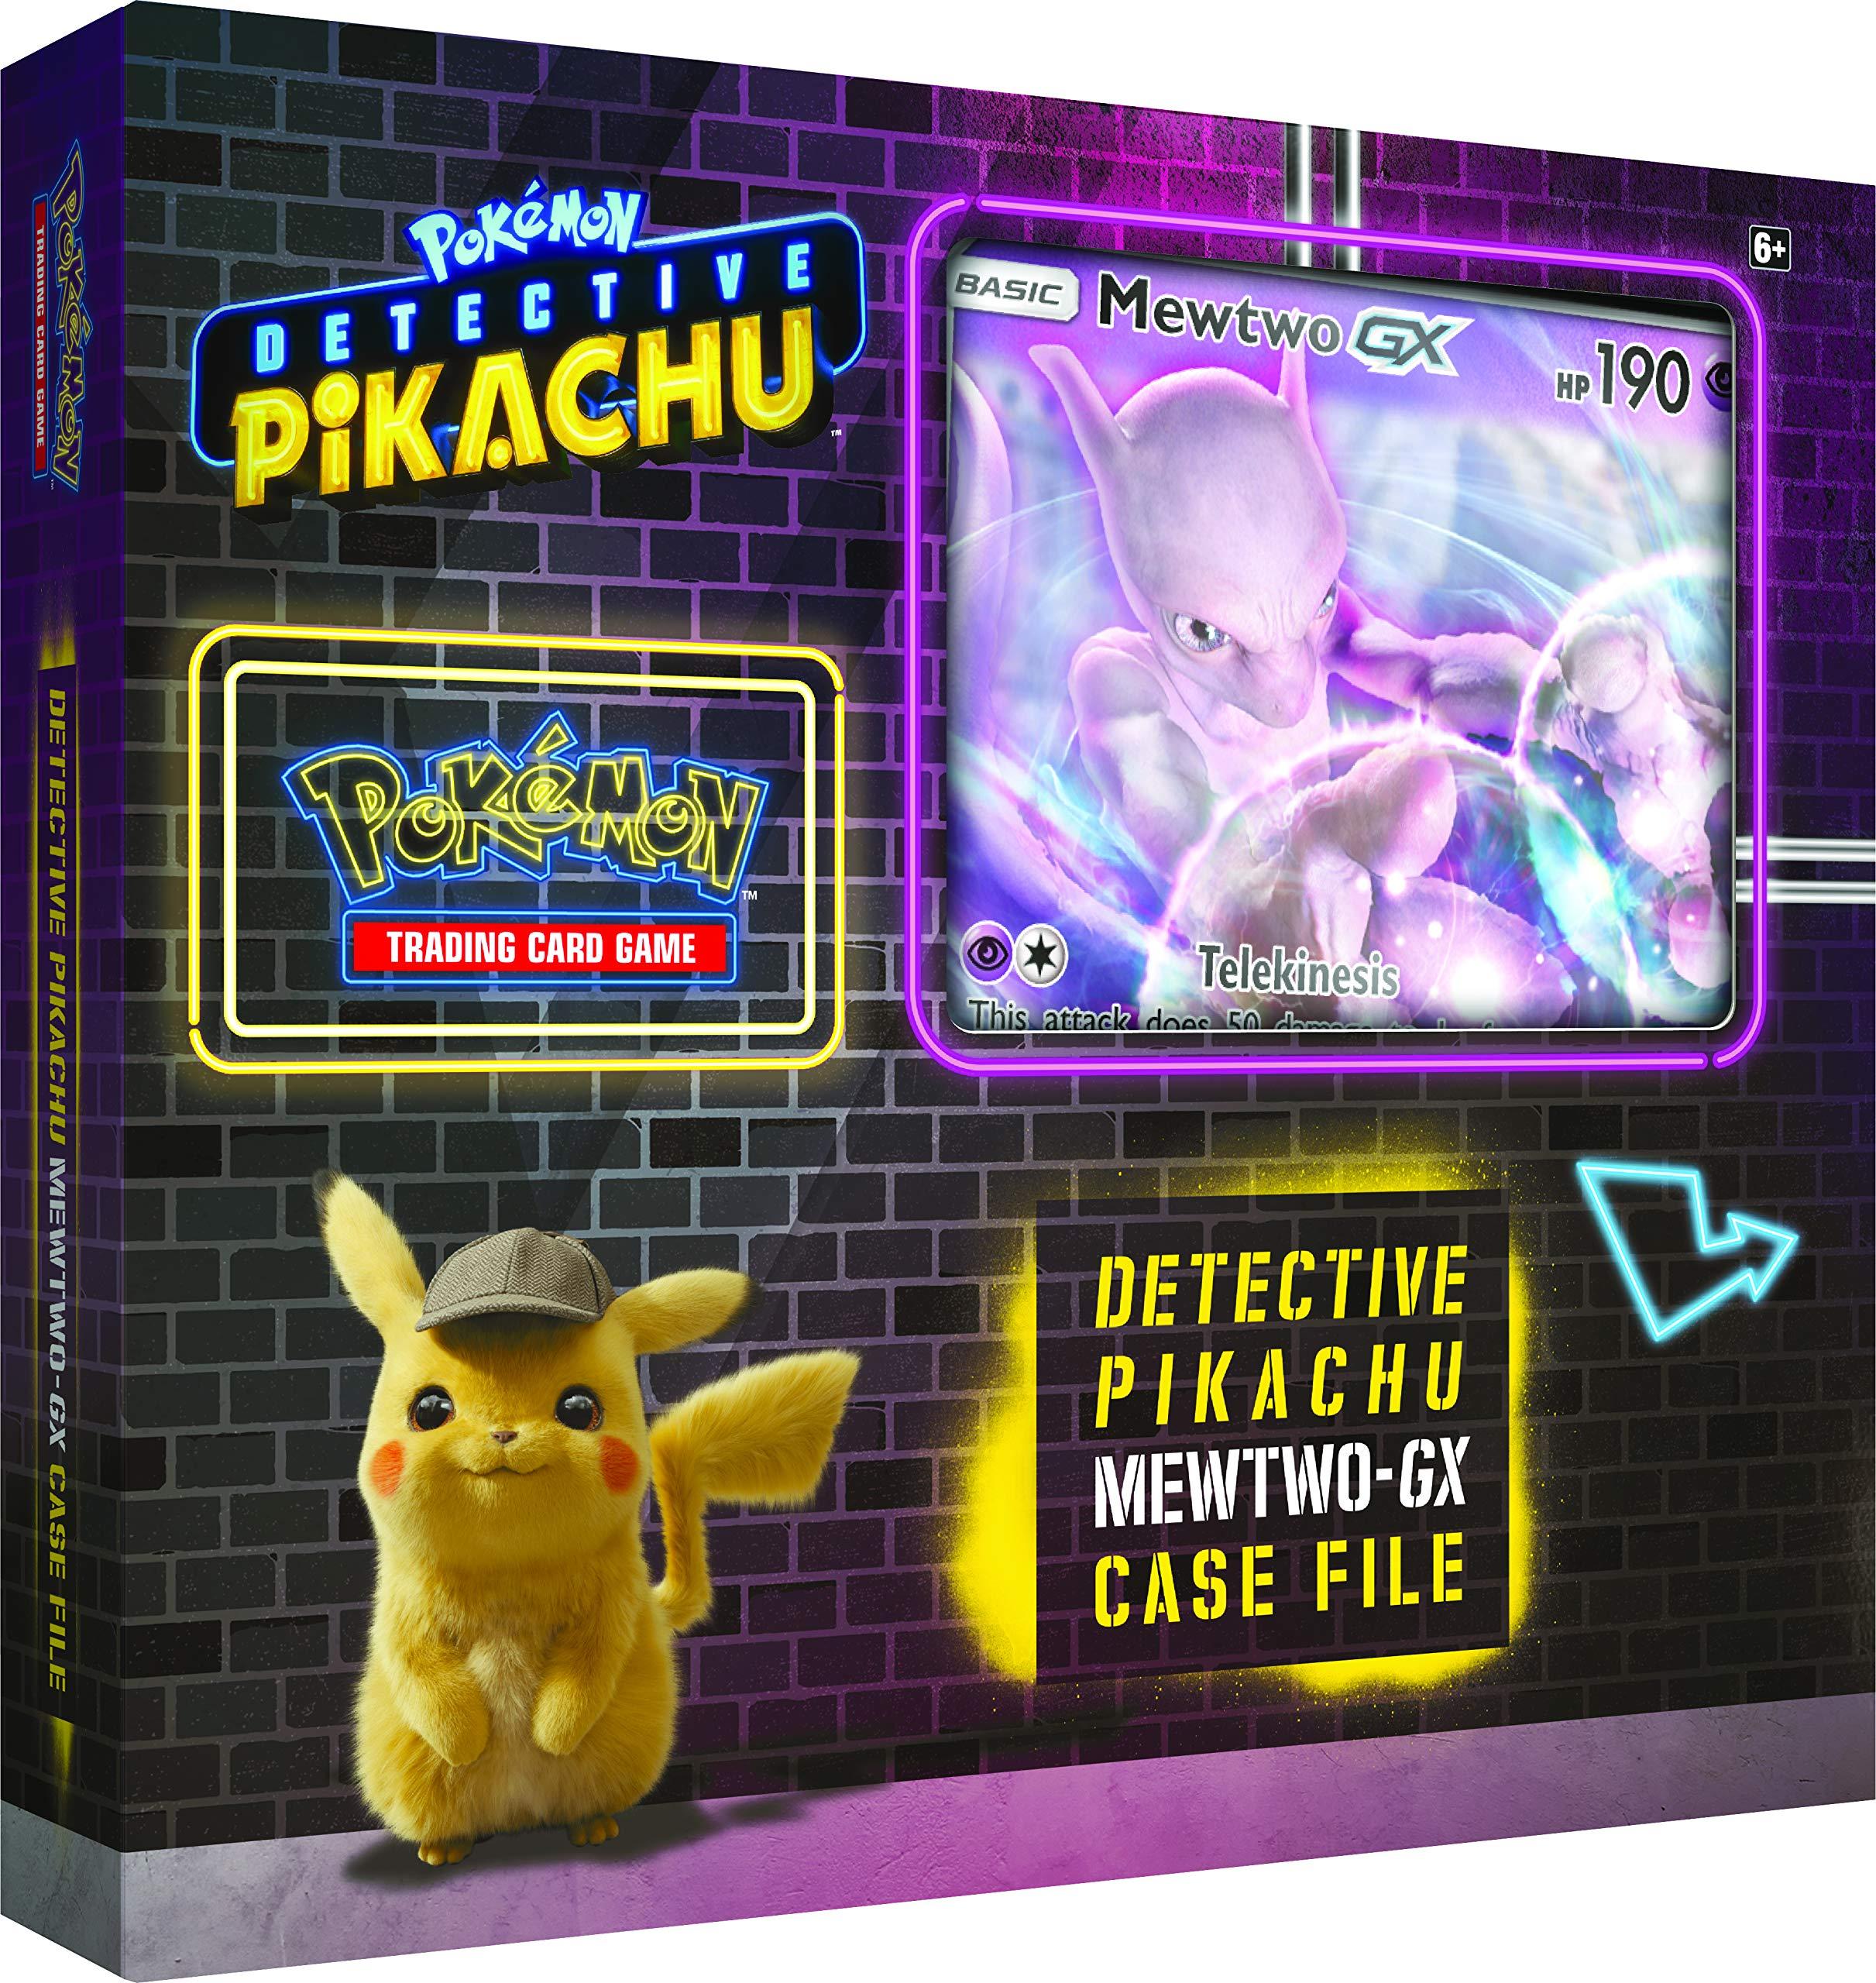 Pokemon TCG: Detective Pikachu Mewtwo-Gx Case File + 6 Booster Pack + A Foil Promo Gx Card + A Oversize Gx Foil Card